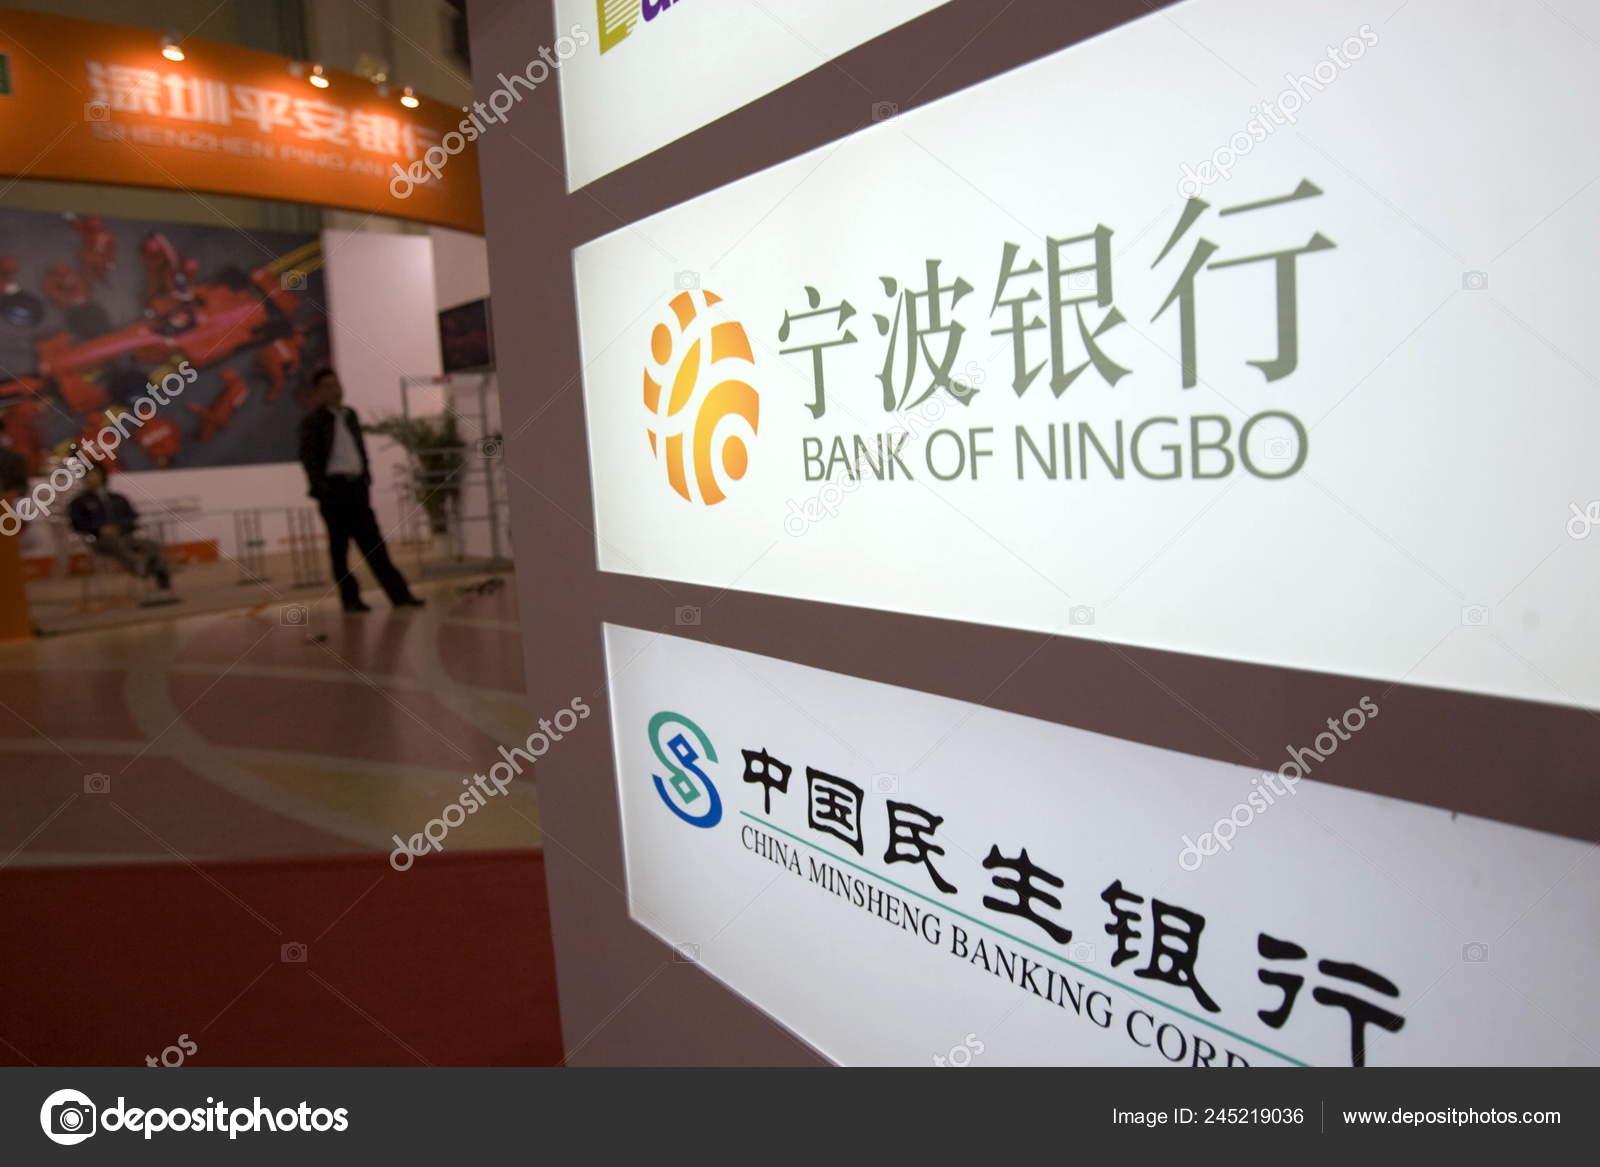 Design Bank Cor.Signboards Bank Ningbo Top China Minsheng Banking Corp Ltd Seen